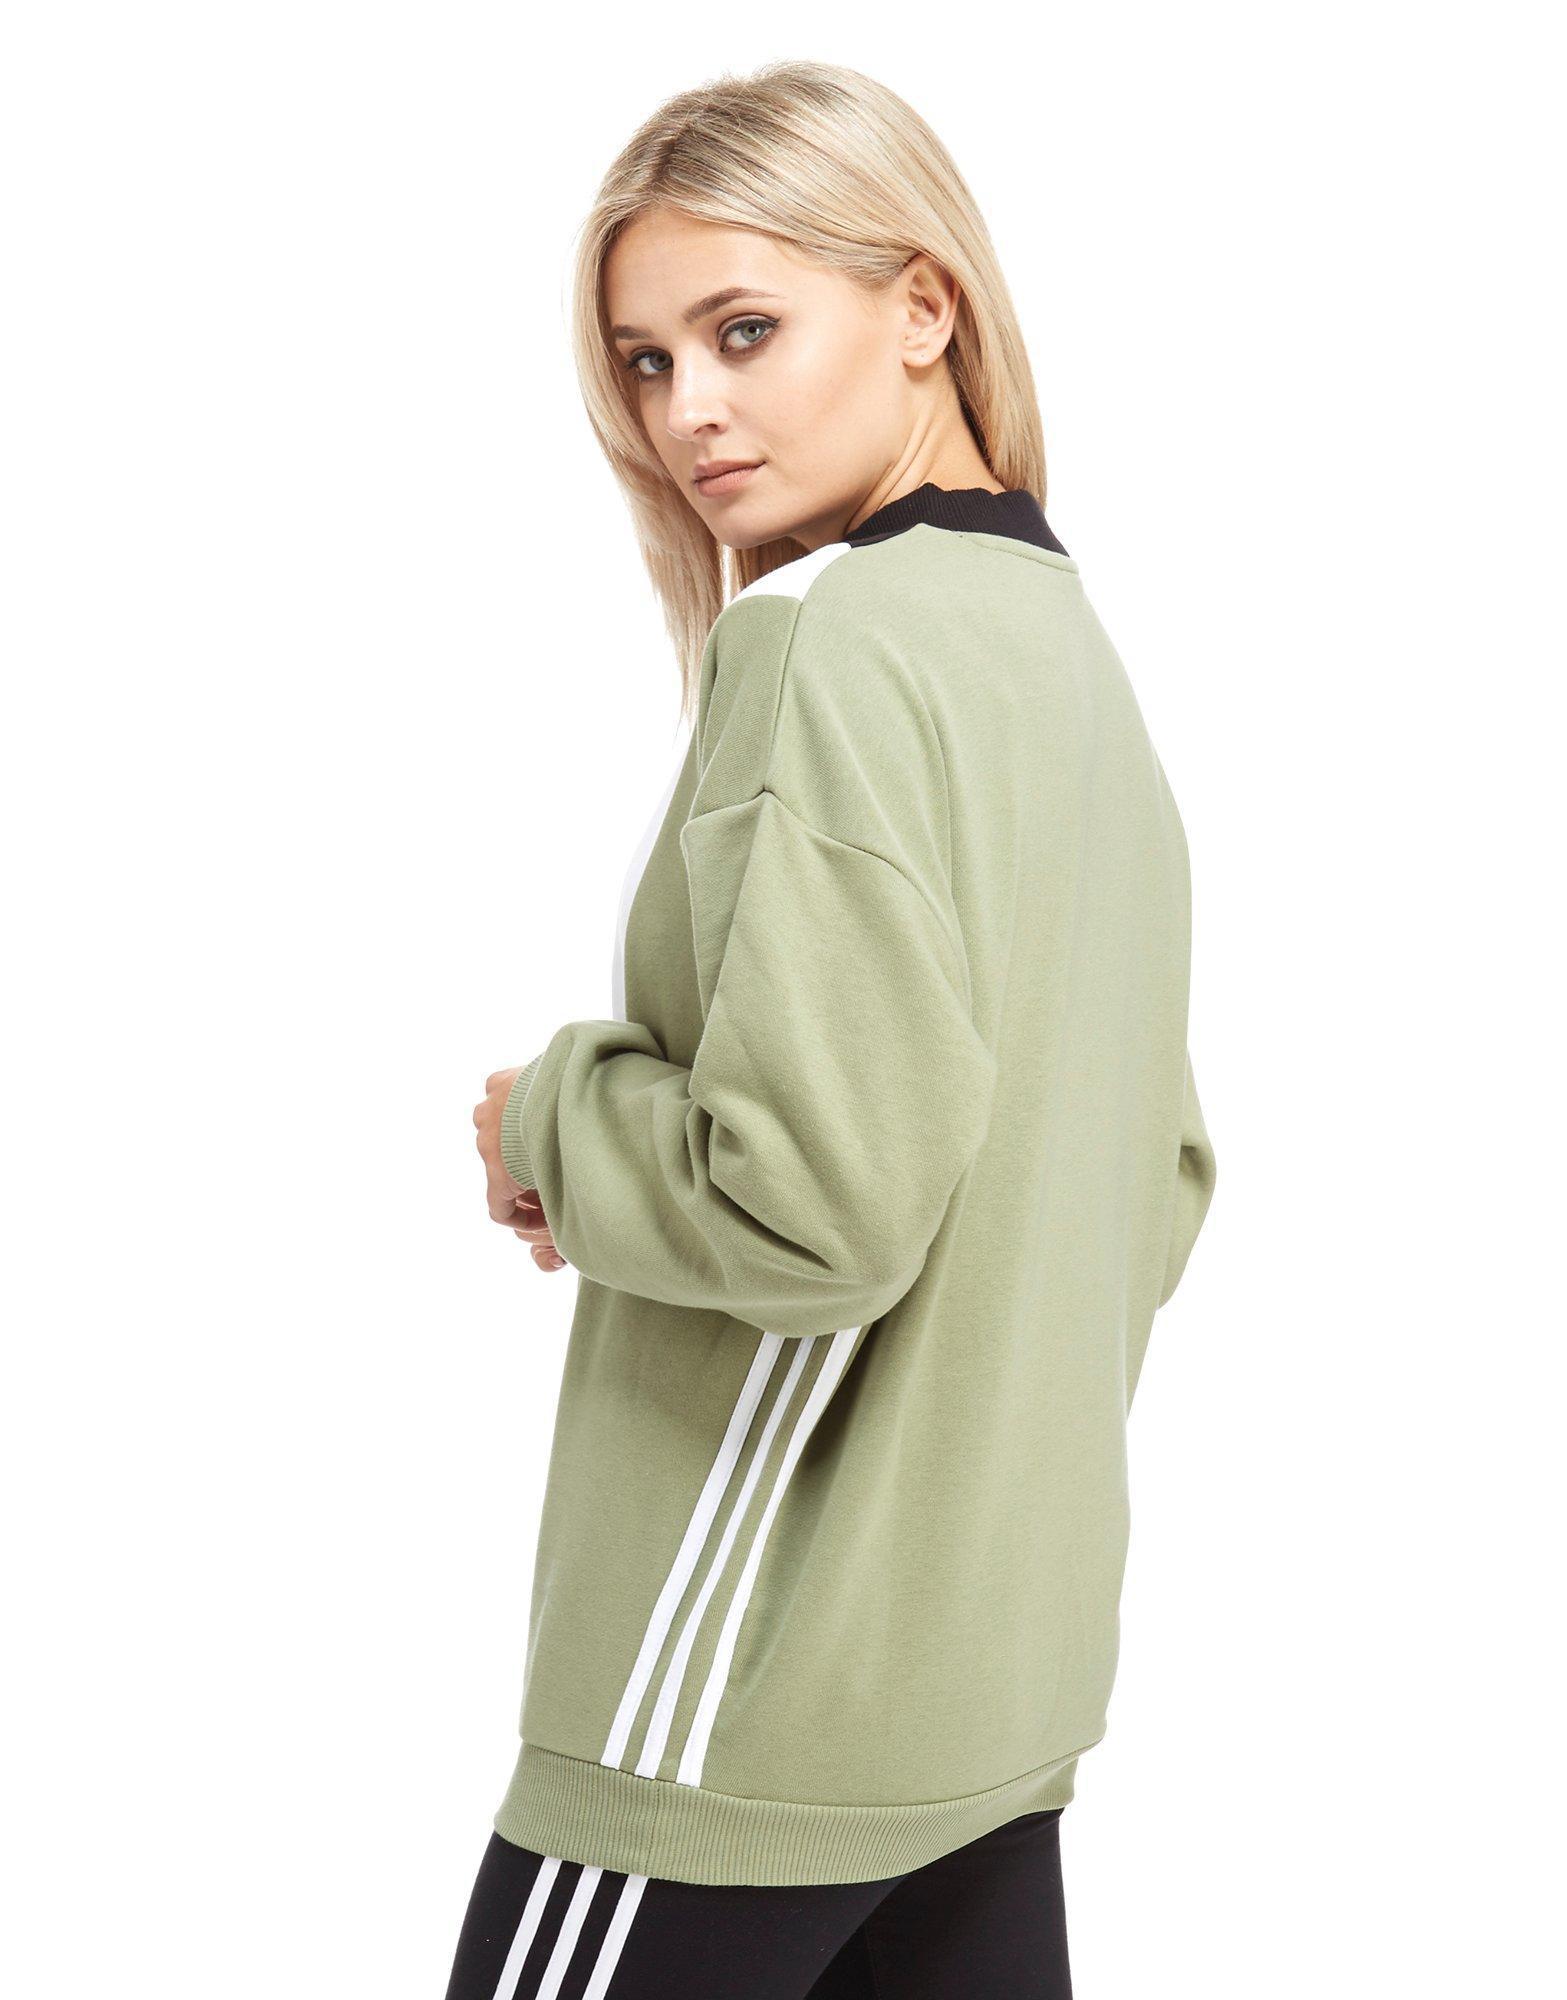 Adidas Originals Black Chevron Sweatshirt